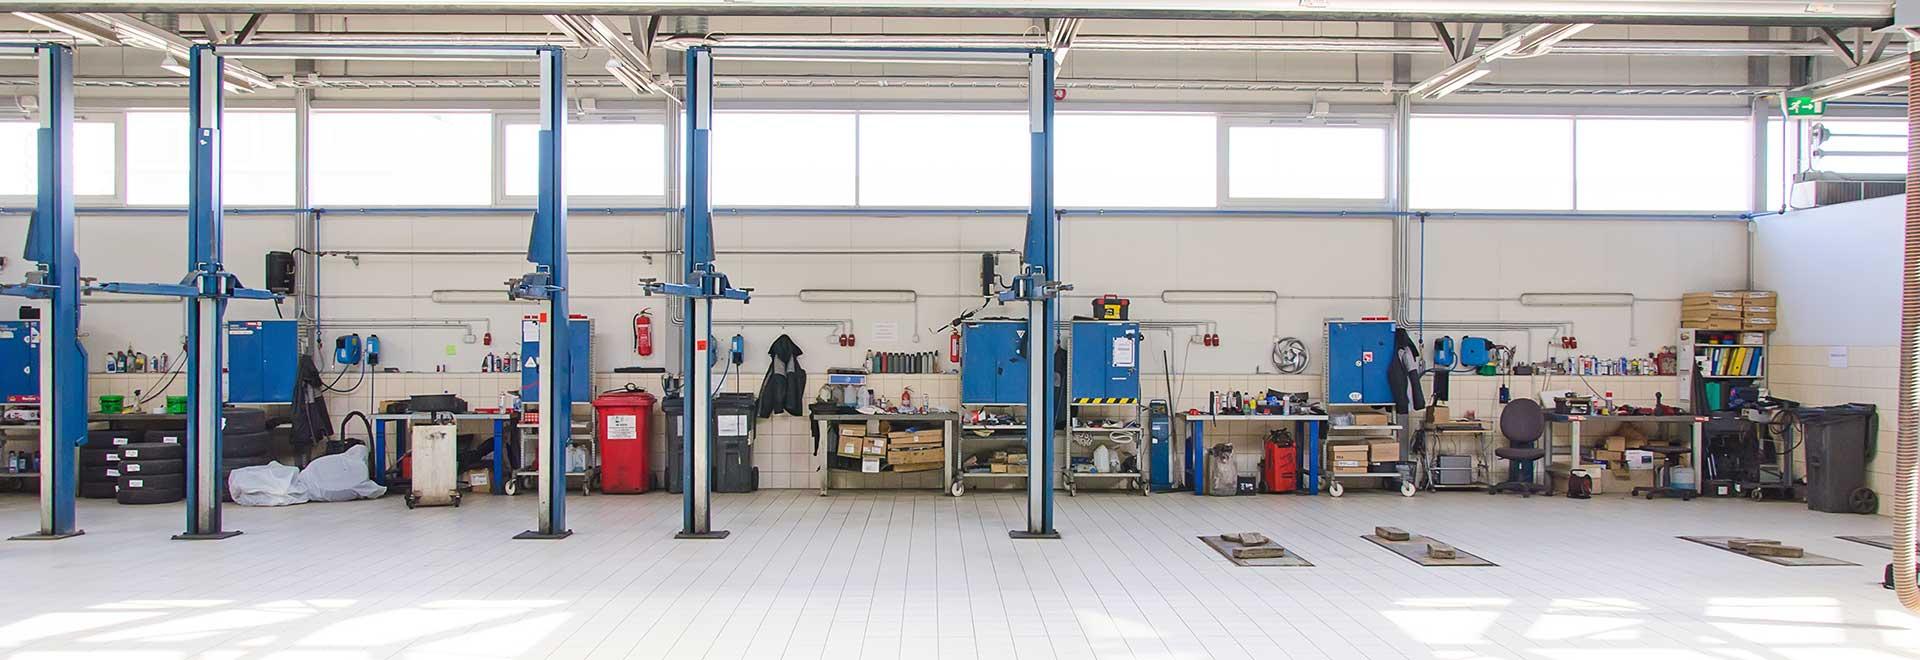 Auto repair shop photo empty